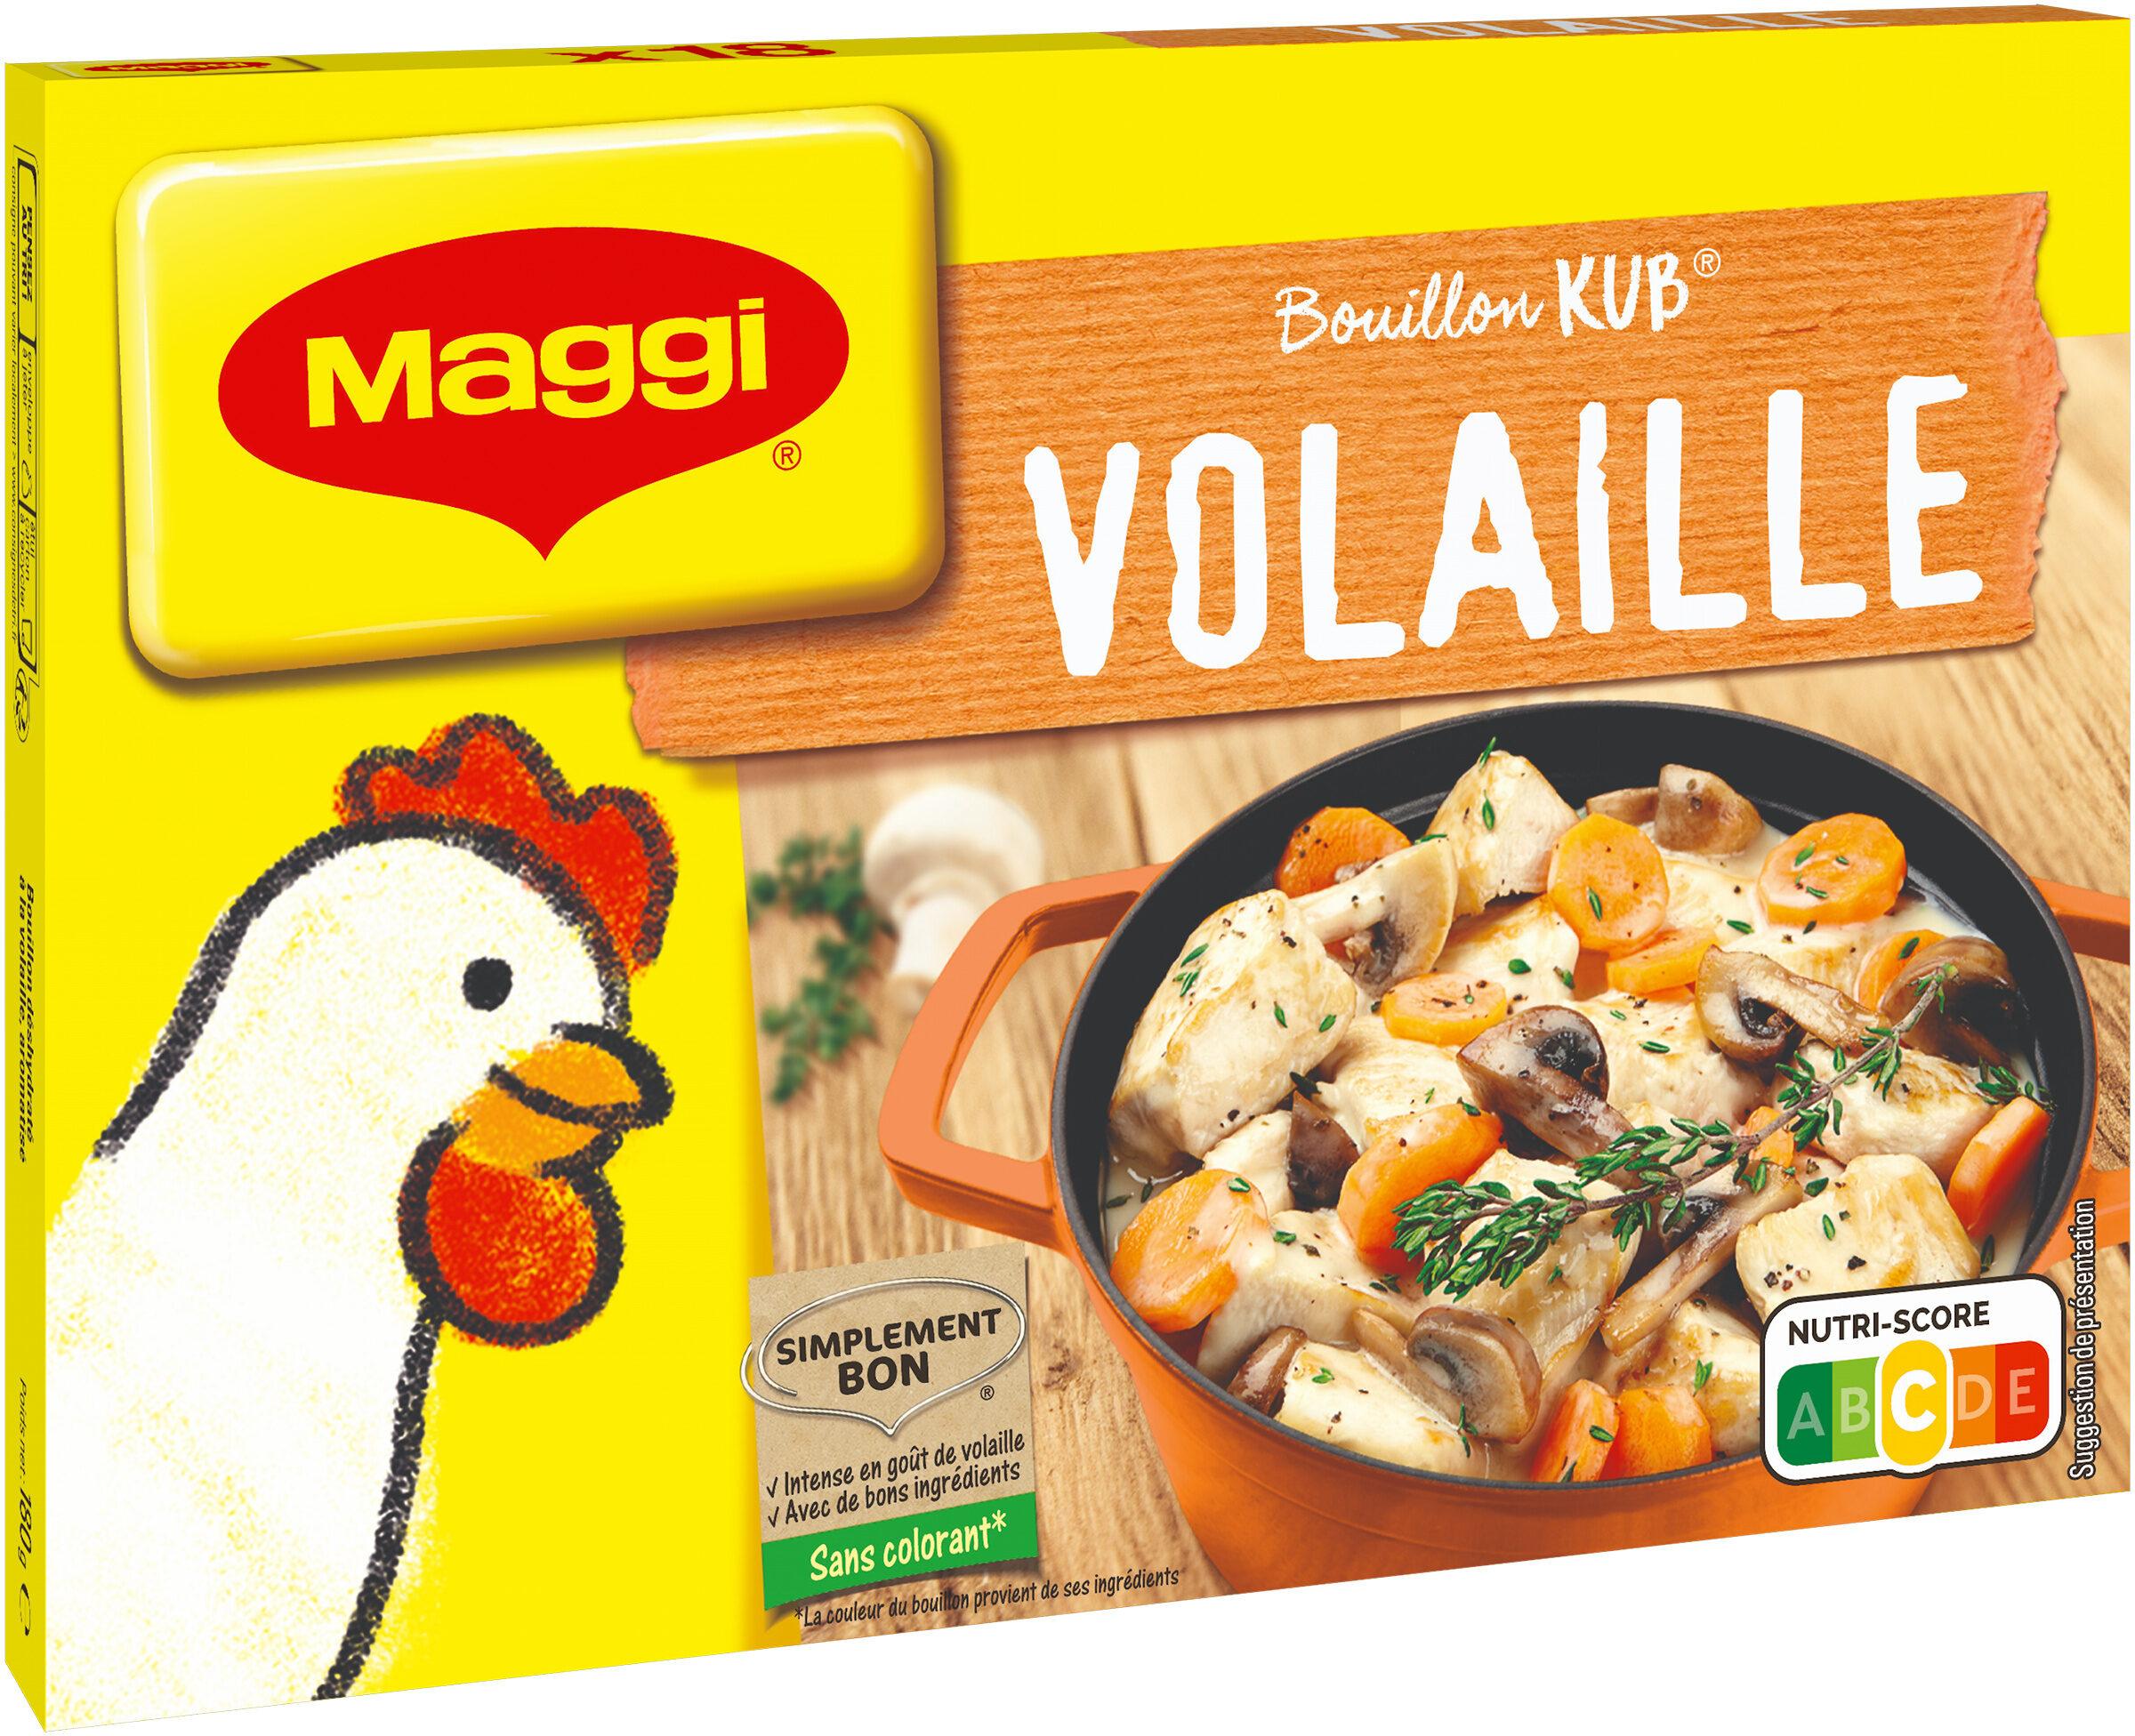 MAGGI Bouillon KUB Volaille - Product - fr